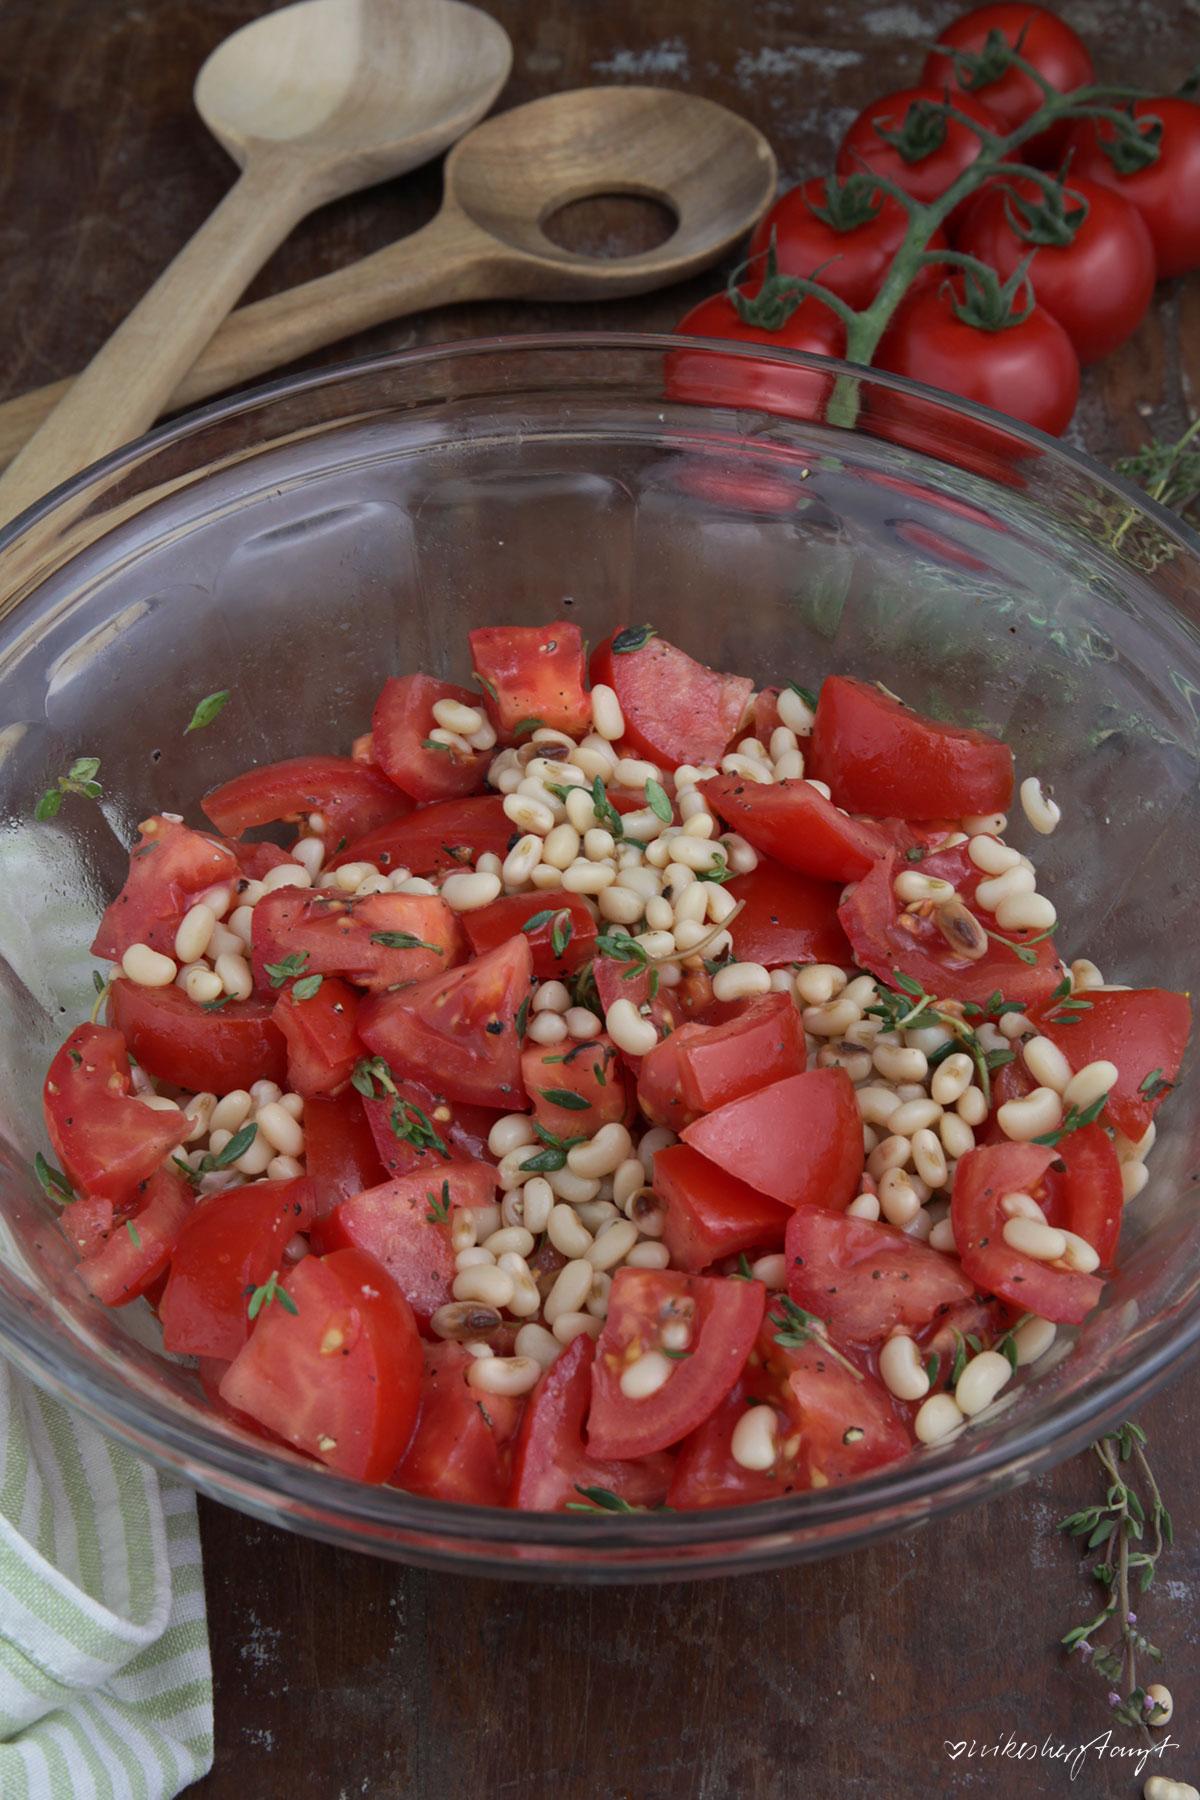 trasimener böhnchen mit tomaten und thymian, salat, veggie, vegan, food, blog, nikesherztanzt